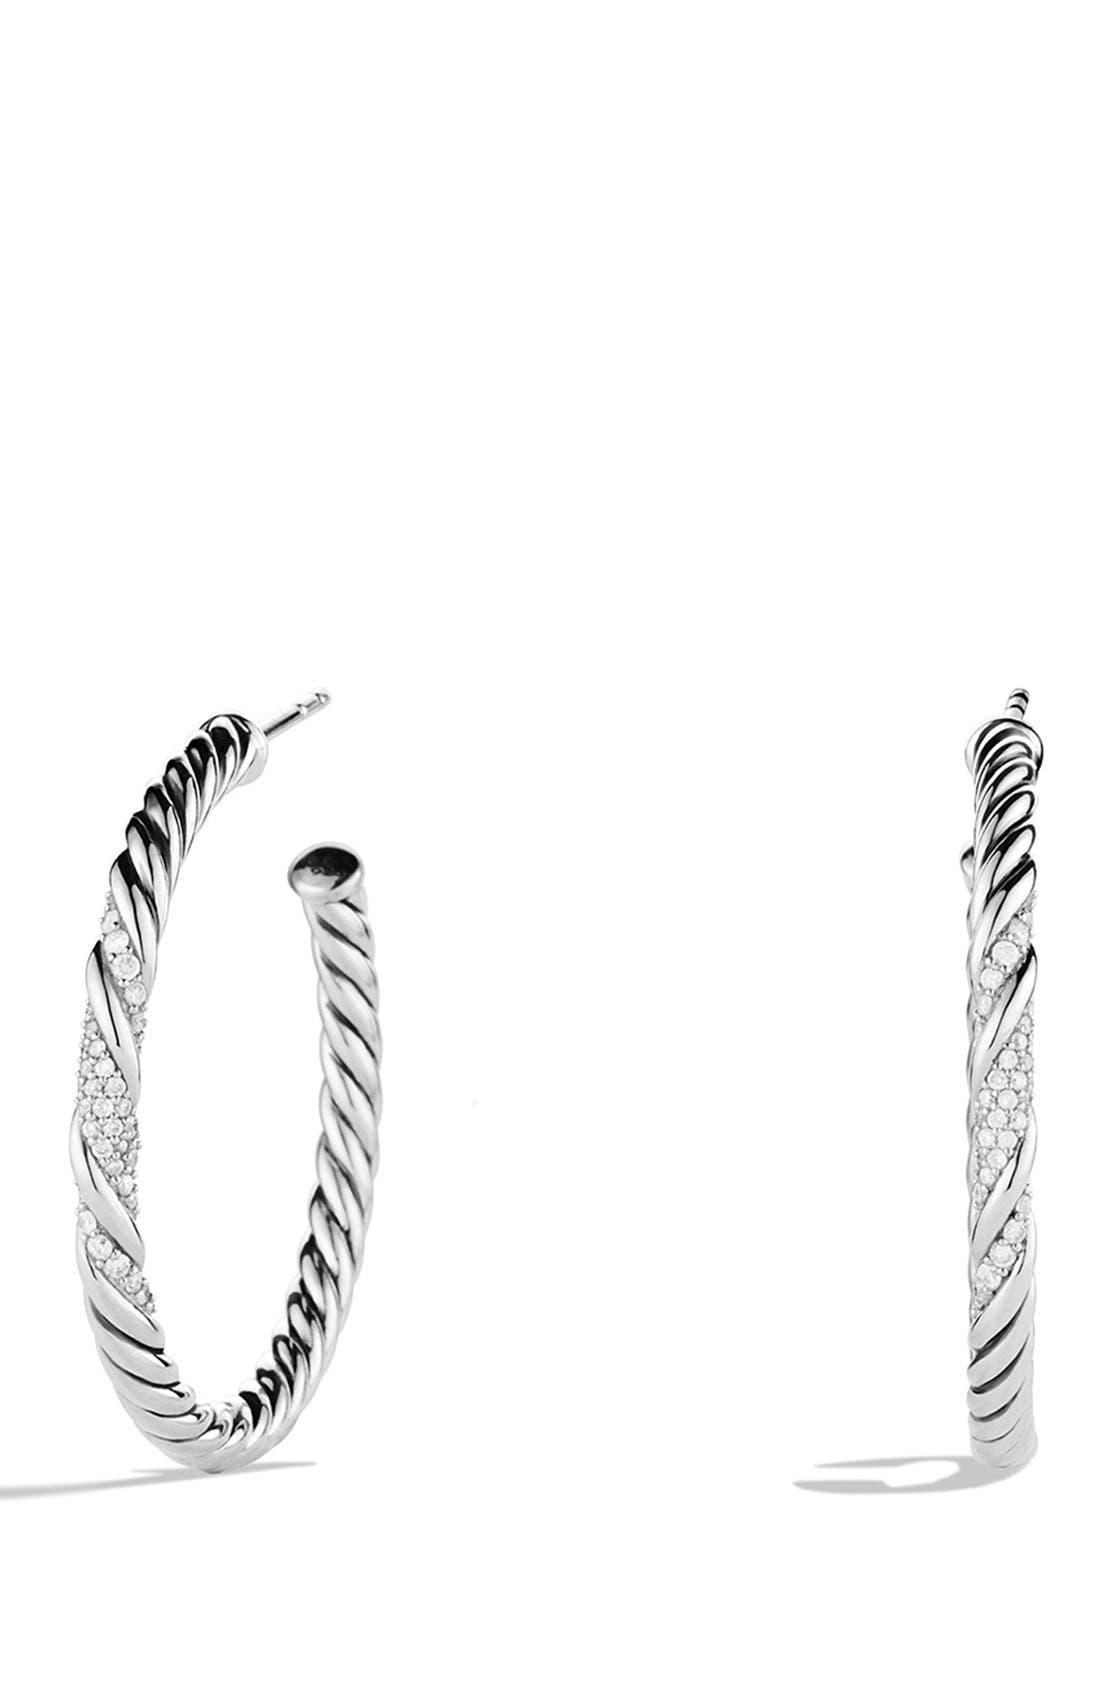 David Yurman 'Willow' Medium Hoop Earrings with Diamonds